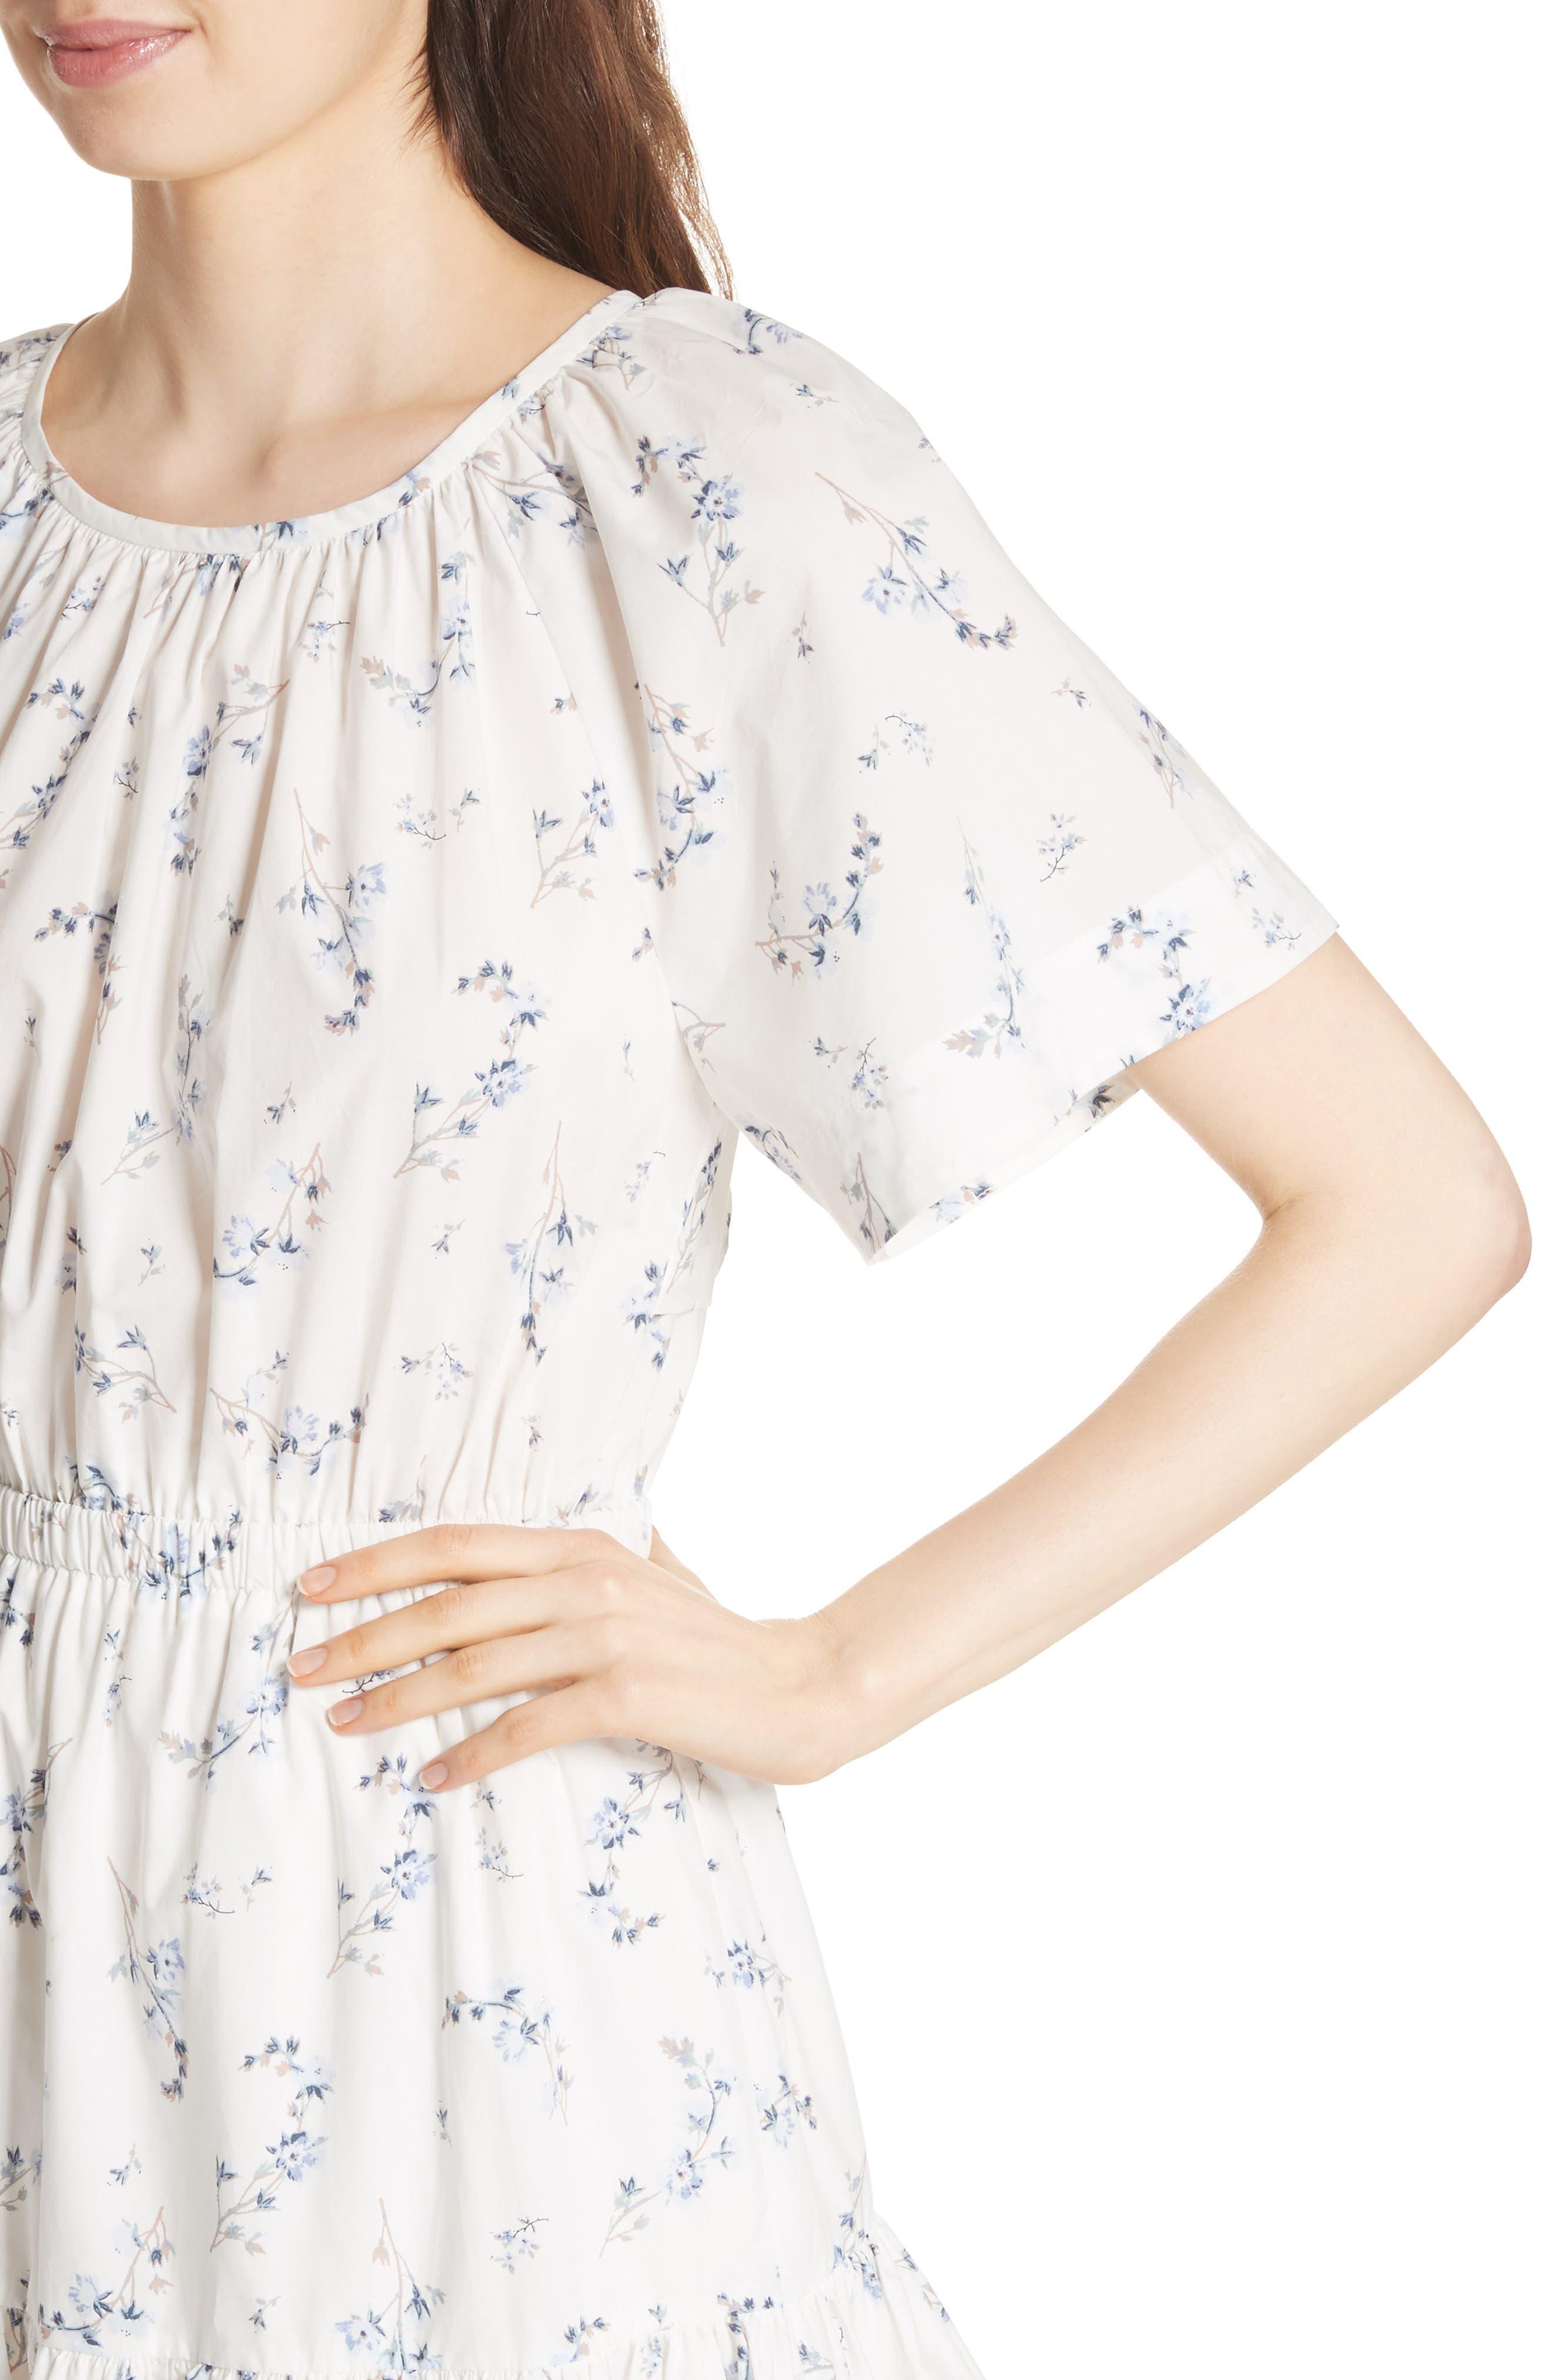 Francine Back Cutout Mini Dress,                             Alternate thumbnail 4, color,                             103